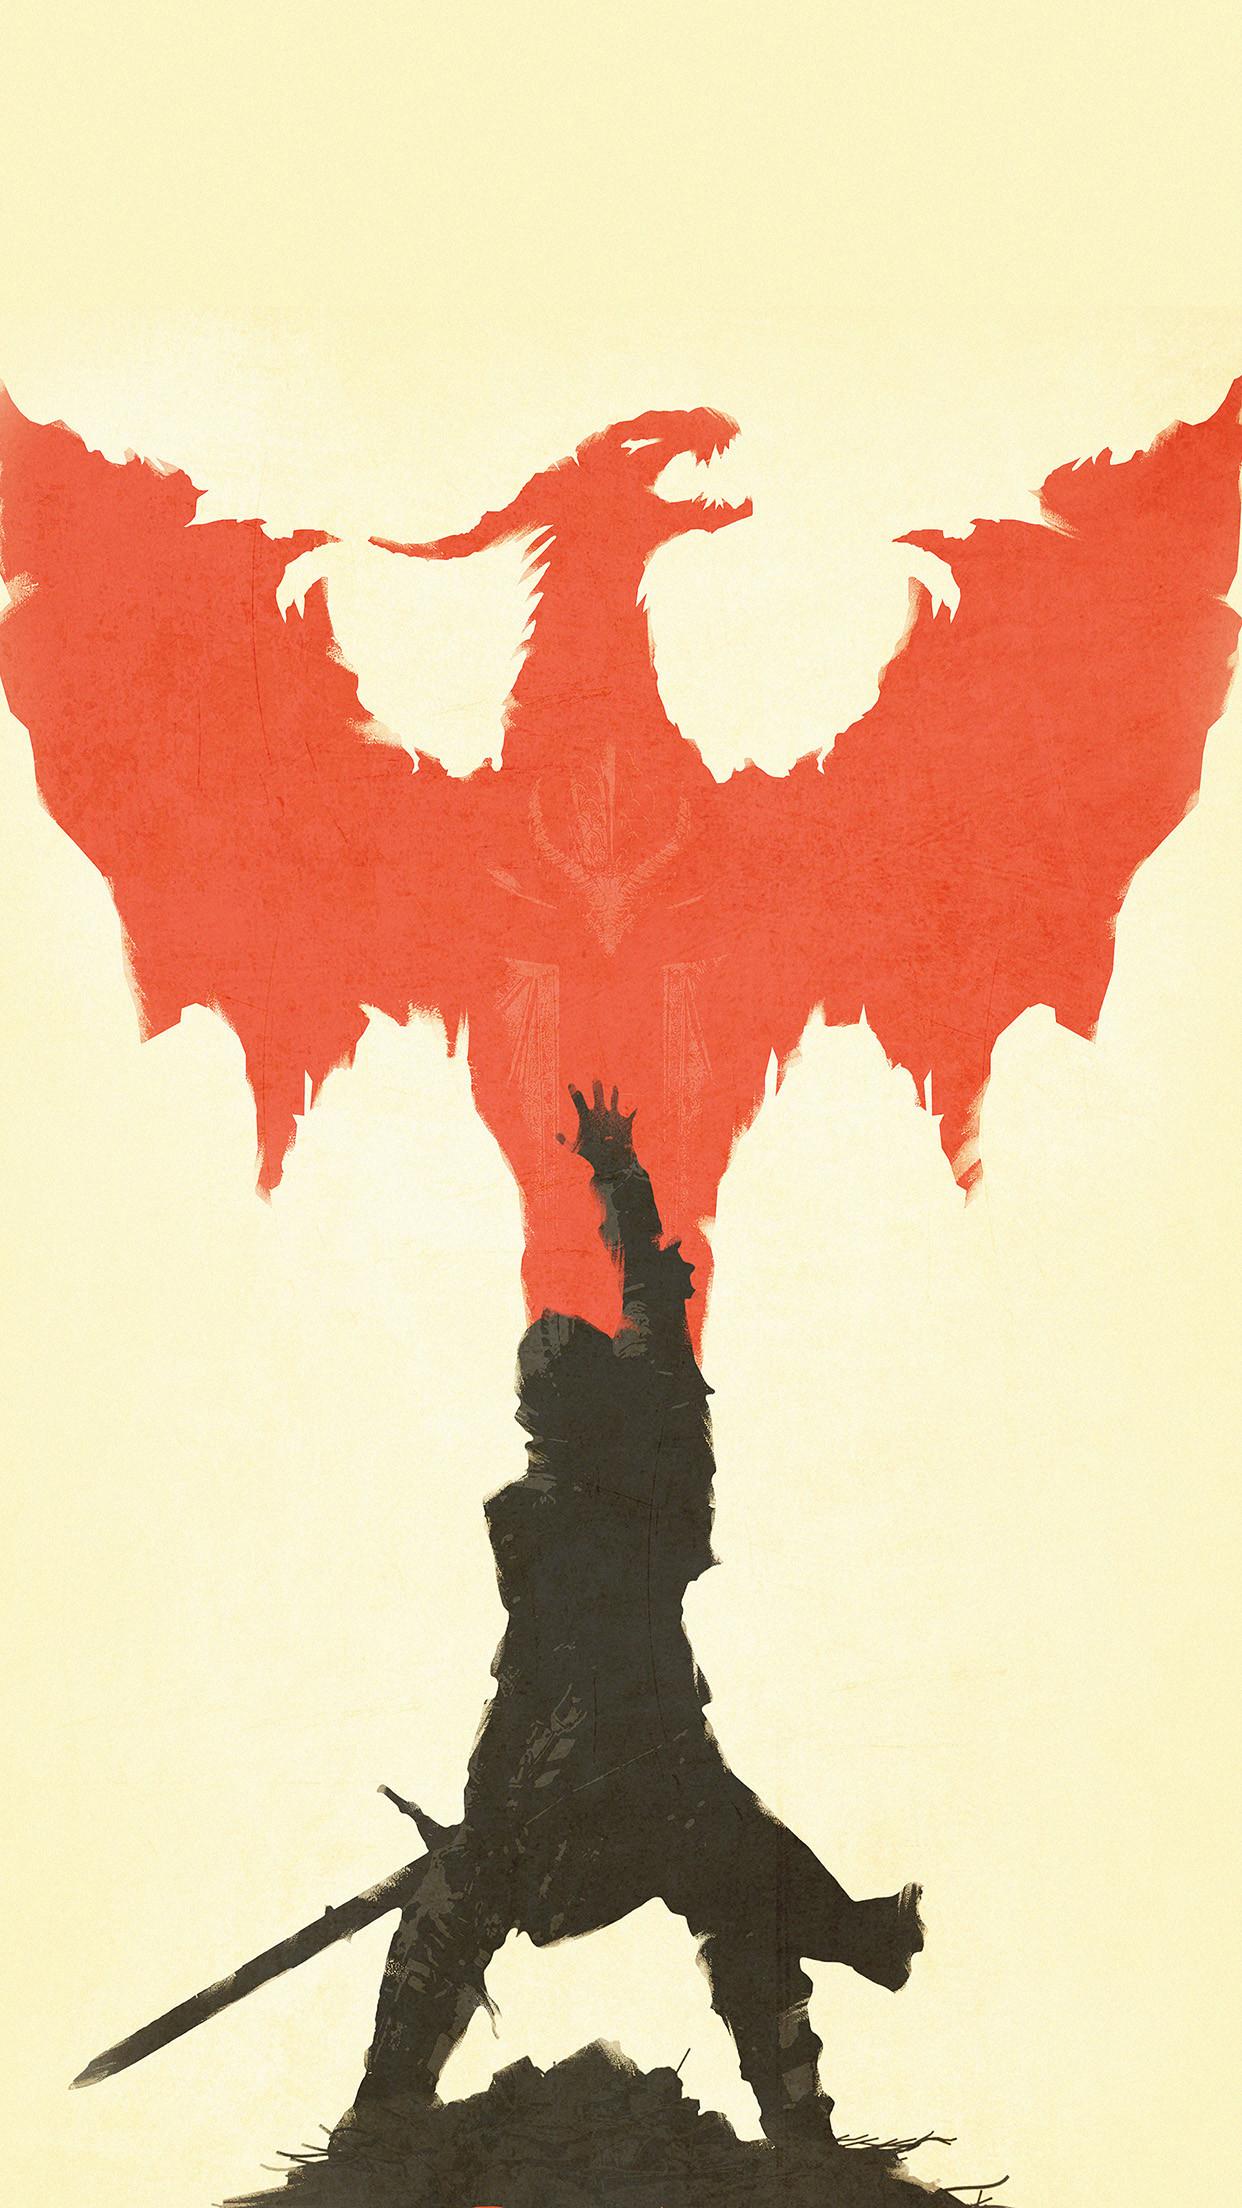 Dragon Age Inquisition Minimal Illustration Android Wallpaper …